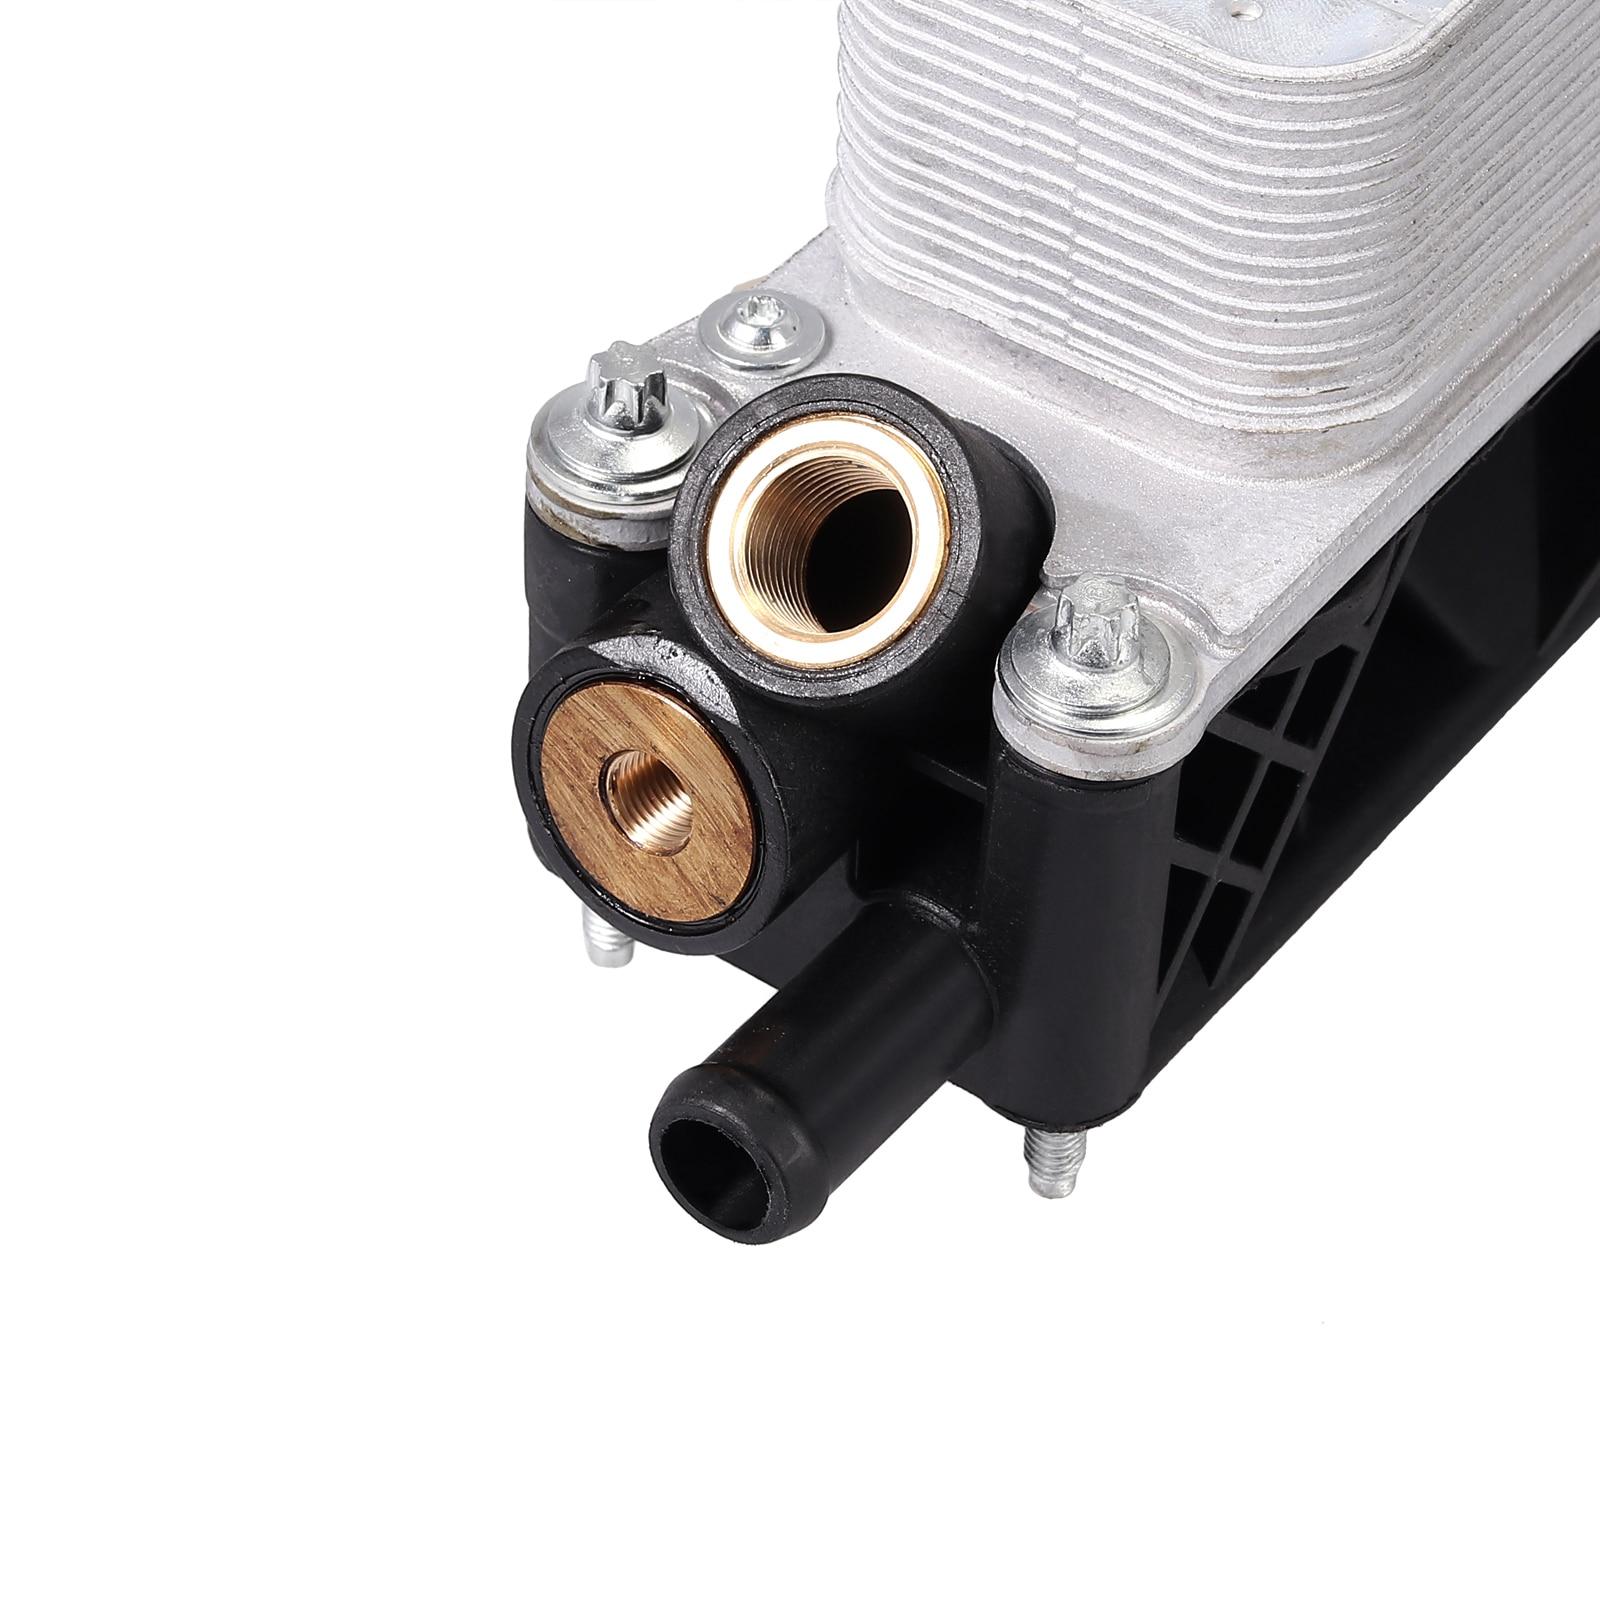 Justech Auto Oliekoeler Filter Behuizing 5184294AE/AD/AC Voor DODGE RAM CHRYSLER JEEP 3.6L V6 Motorolie filter Adapter Behuizing - 6